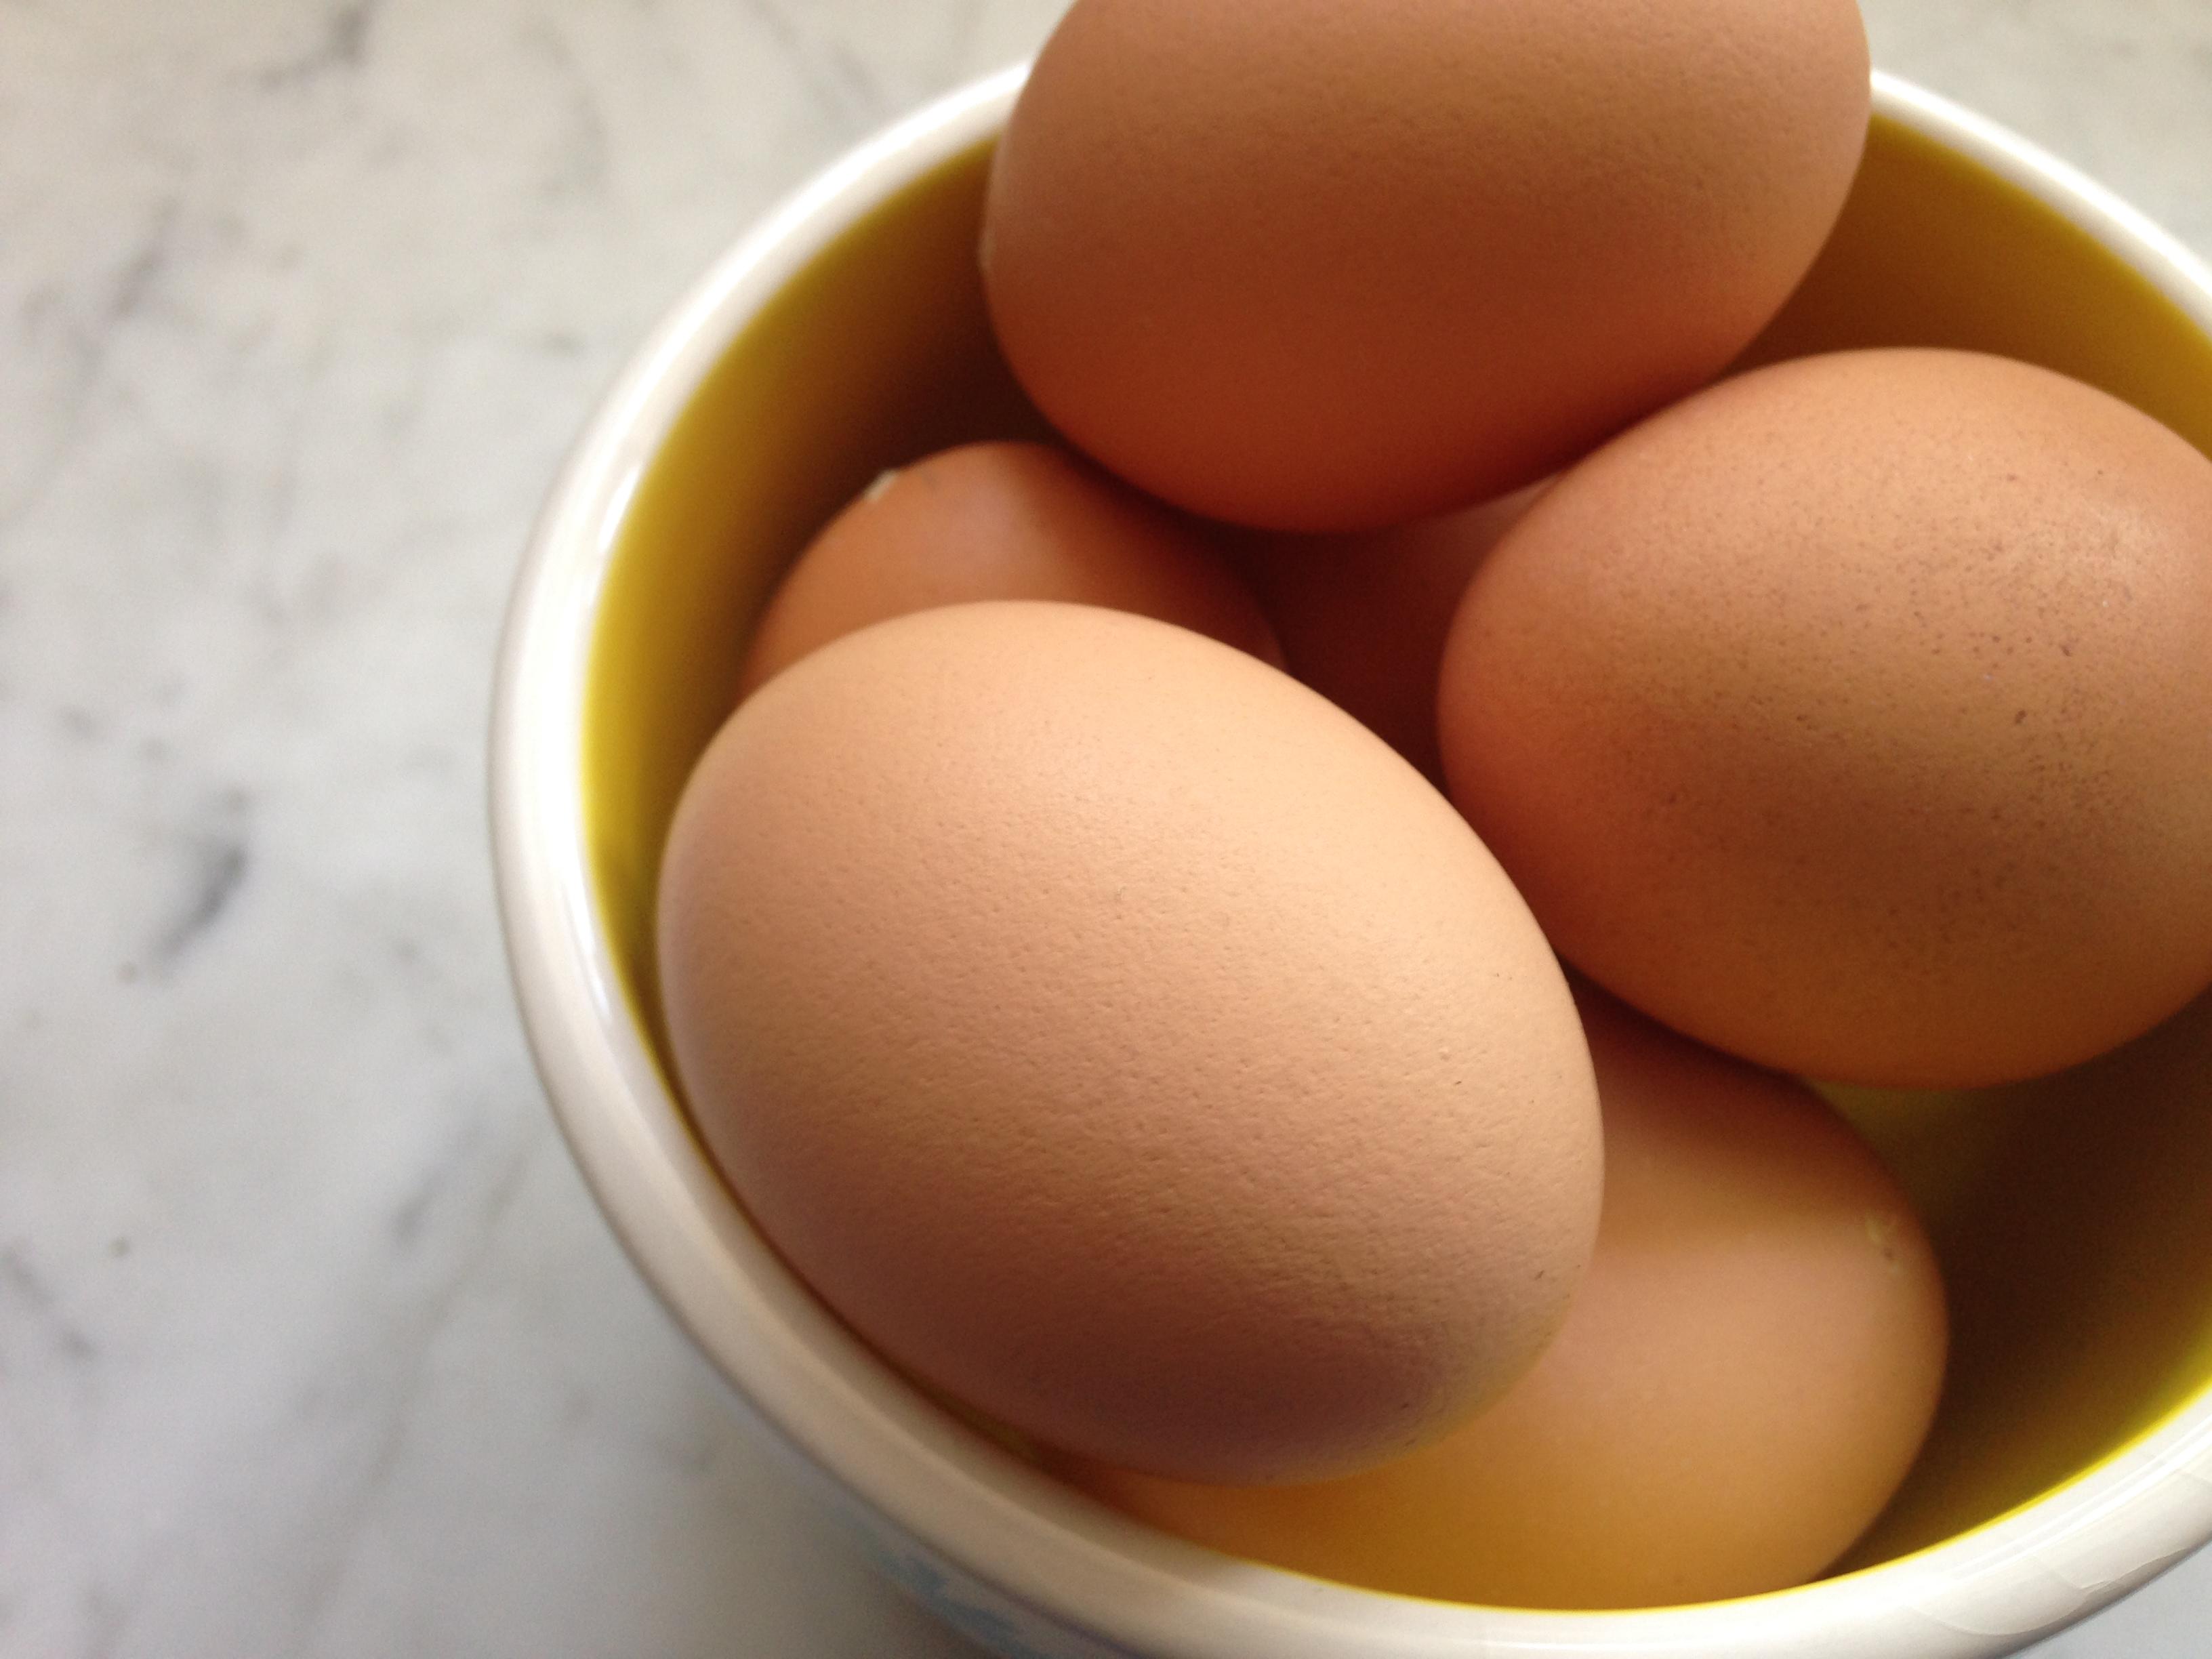 dj eggs